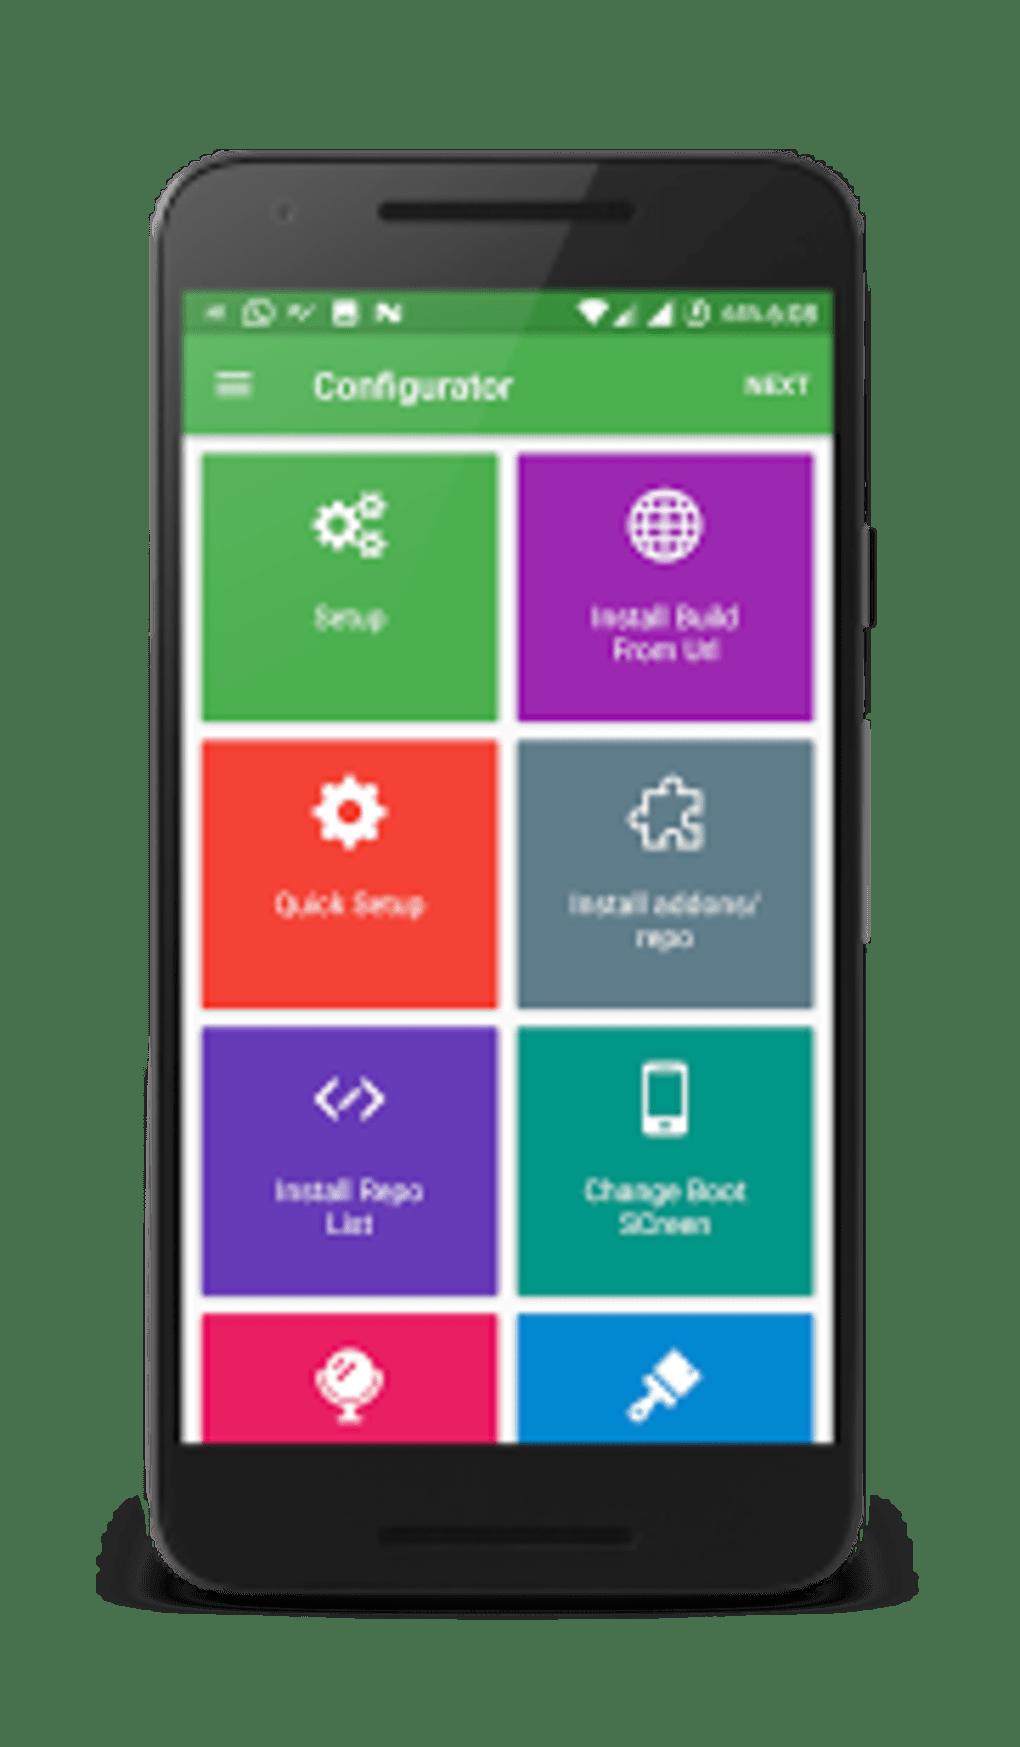 Configurator for Kodi - Complete Kodi Setup Wizard for